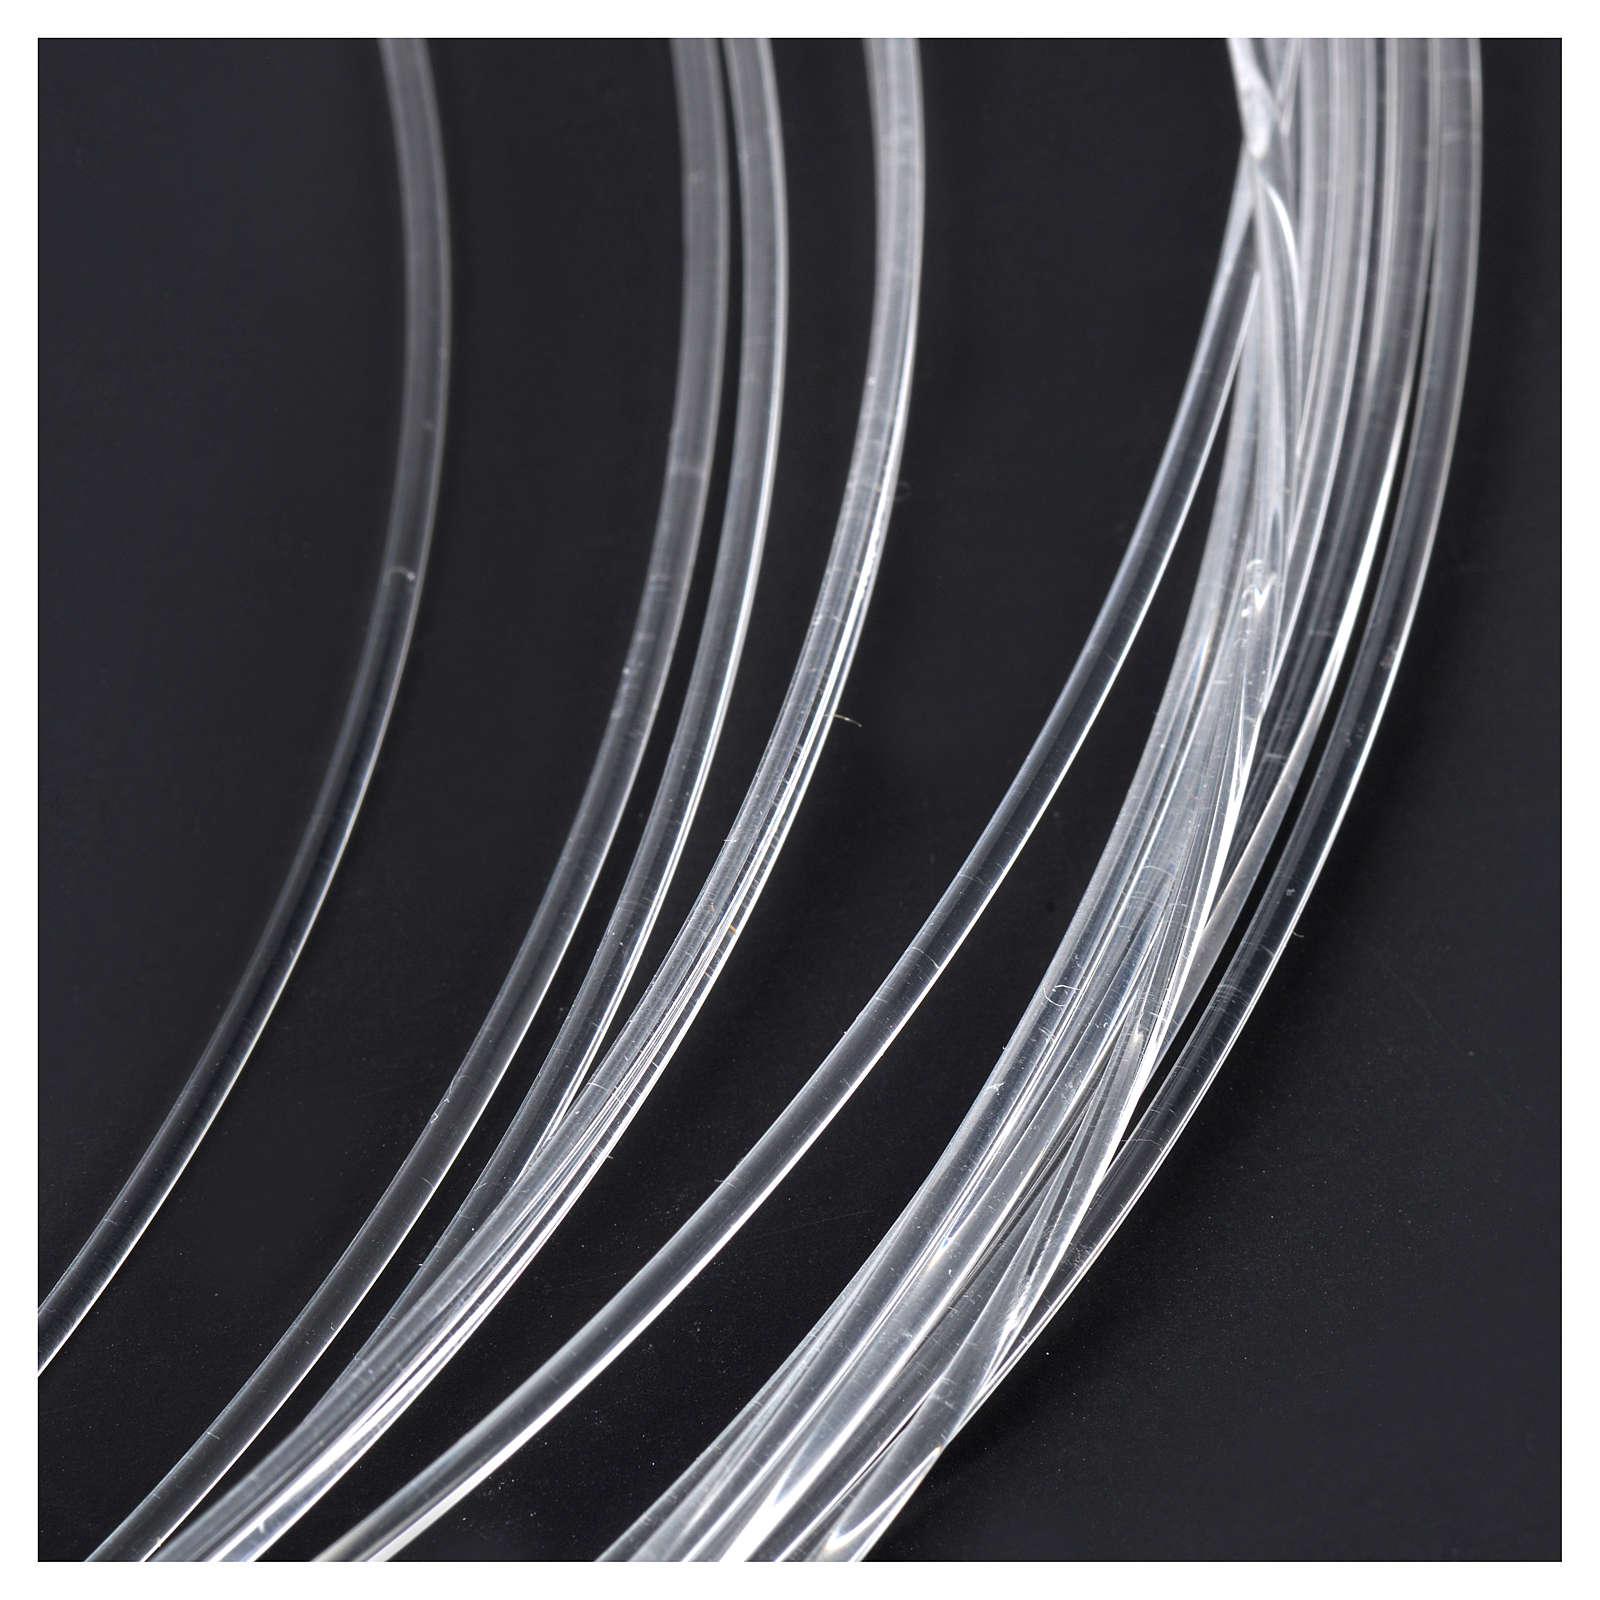 Bobine de fibre optique 10m pour crèche - diam. 1,5 mm 4